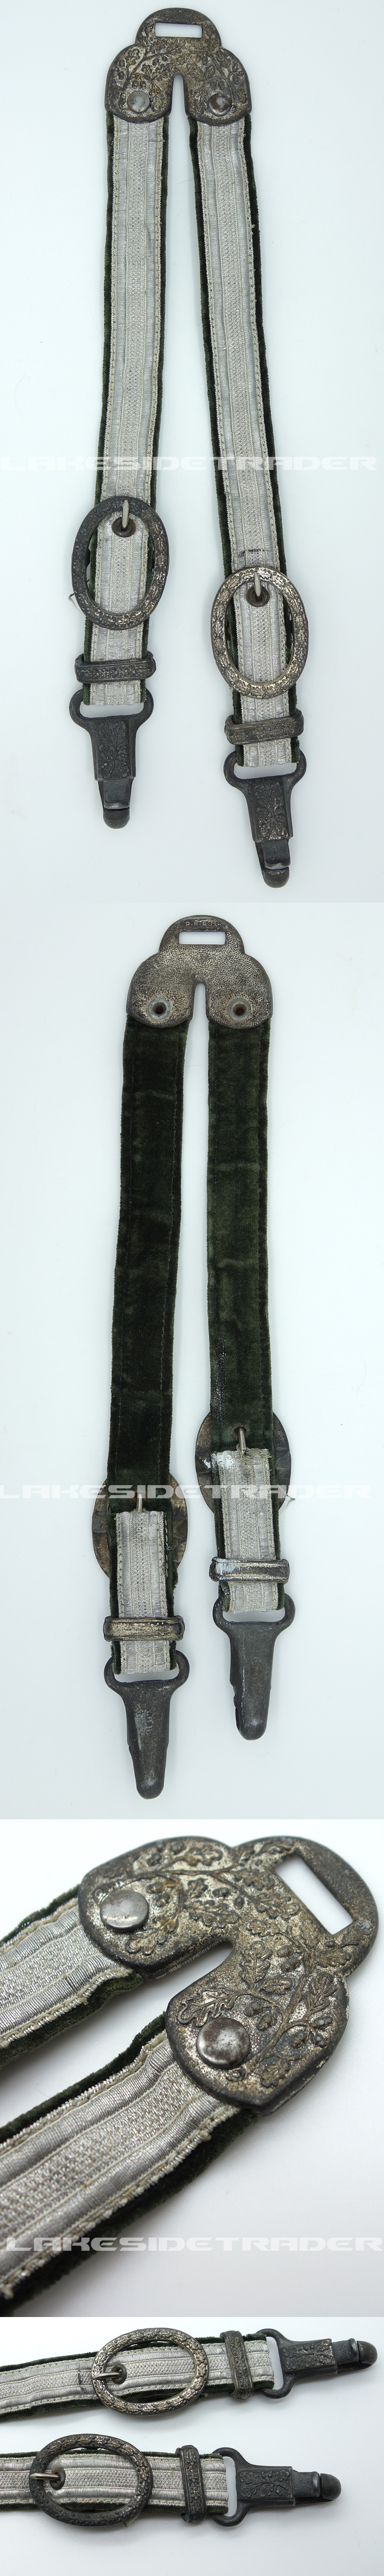 Deluxe Army Horse-shoe Hangers